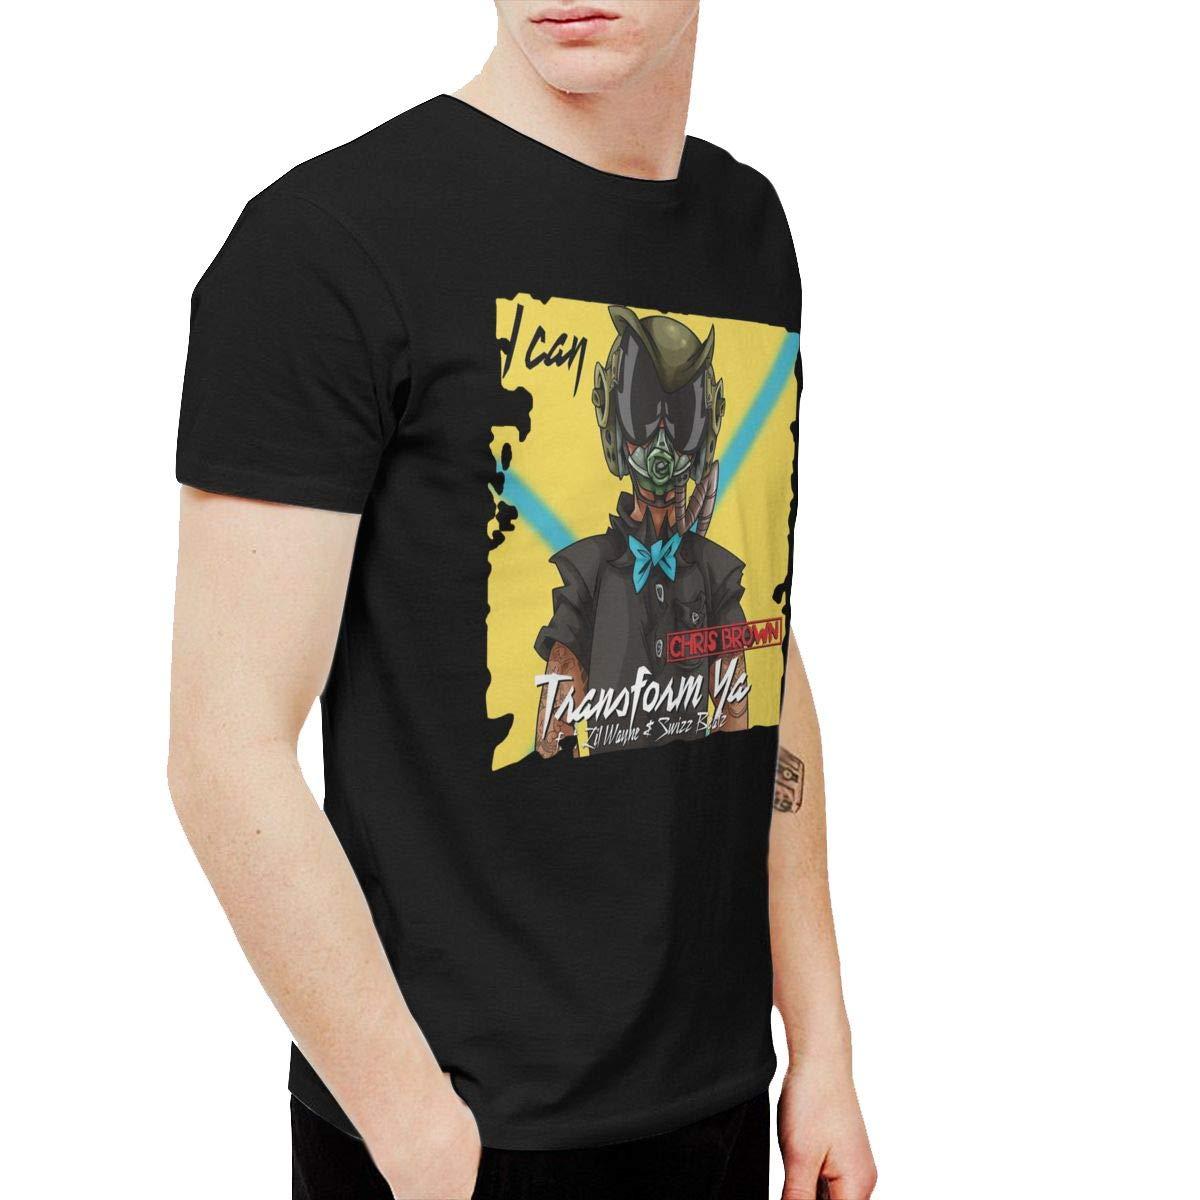 Qybfepbegw S Chris Brown I Can Funny Running Black Tshirts Short Sleeve